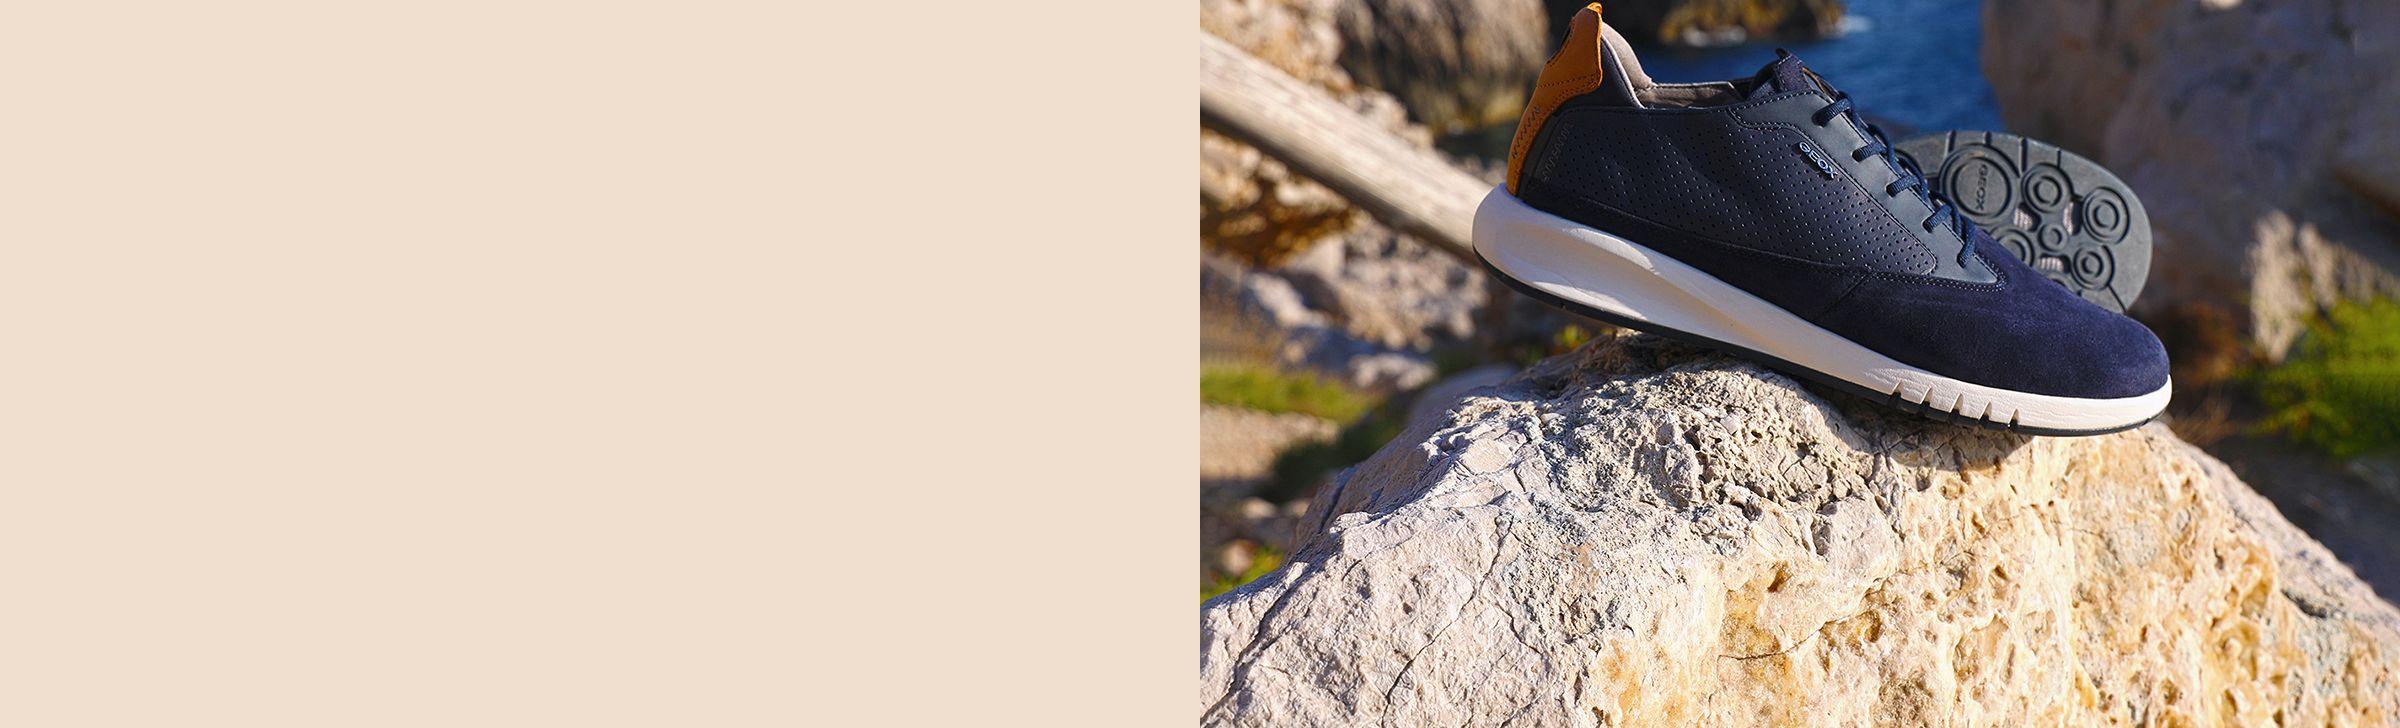 f7f9693215b6 Men s Shoes   Boots